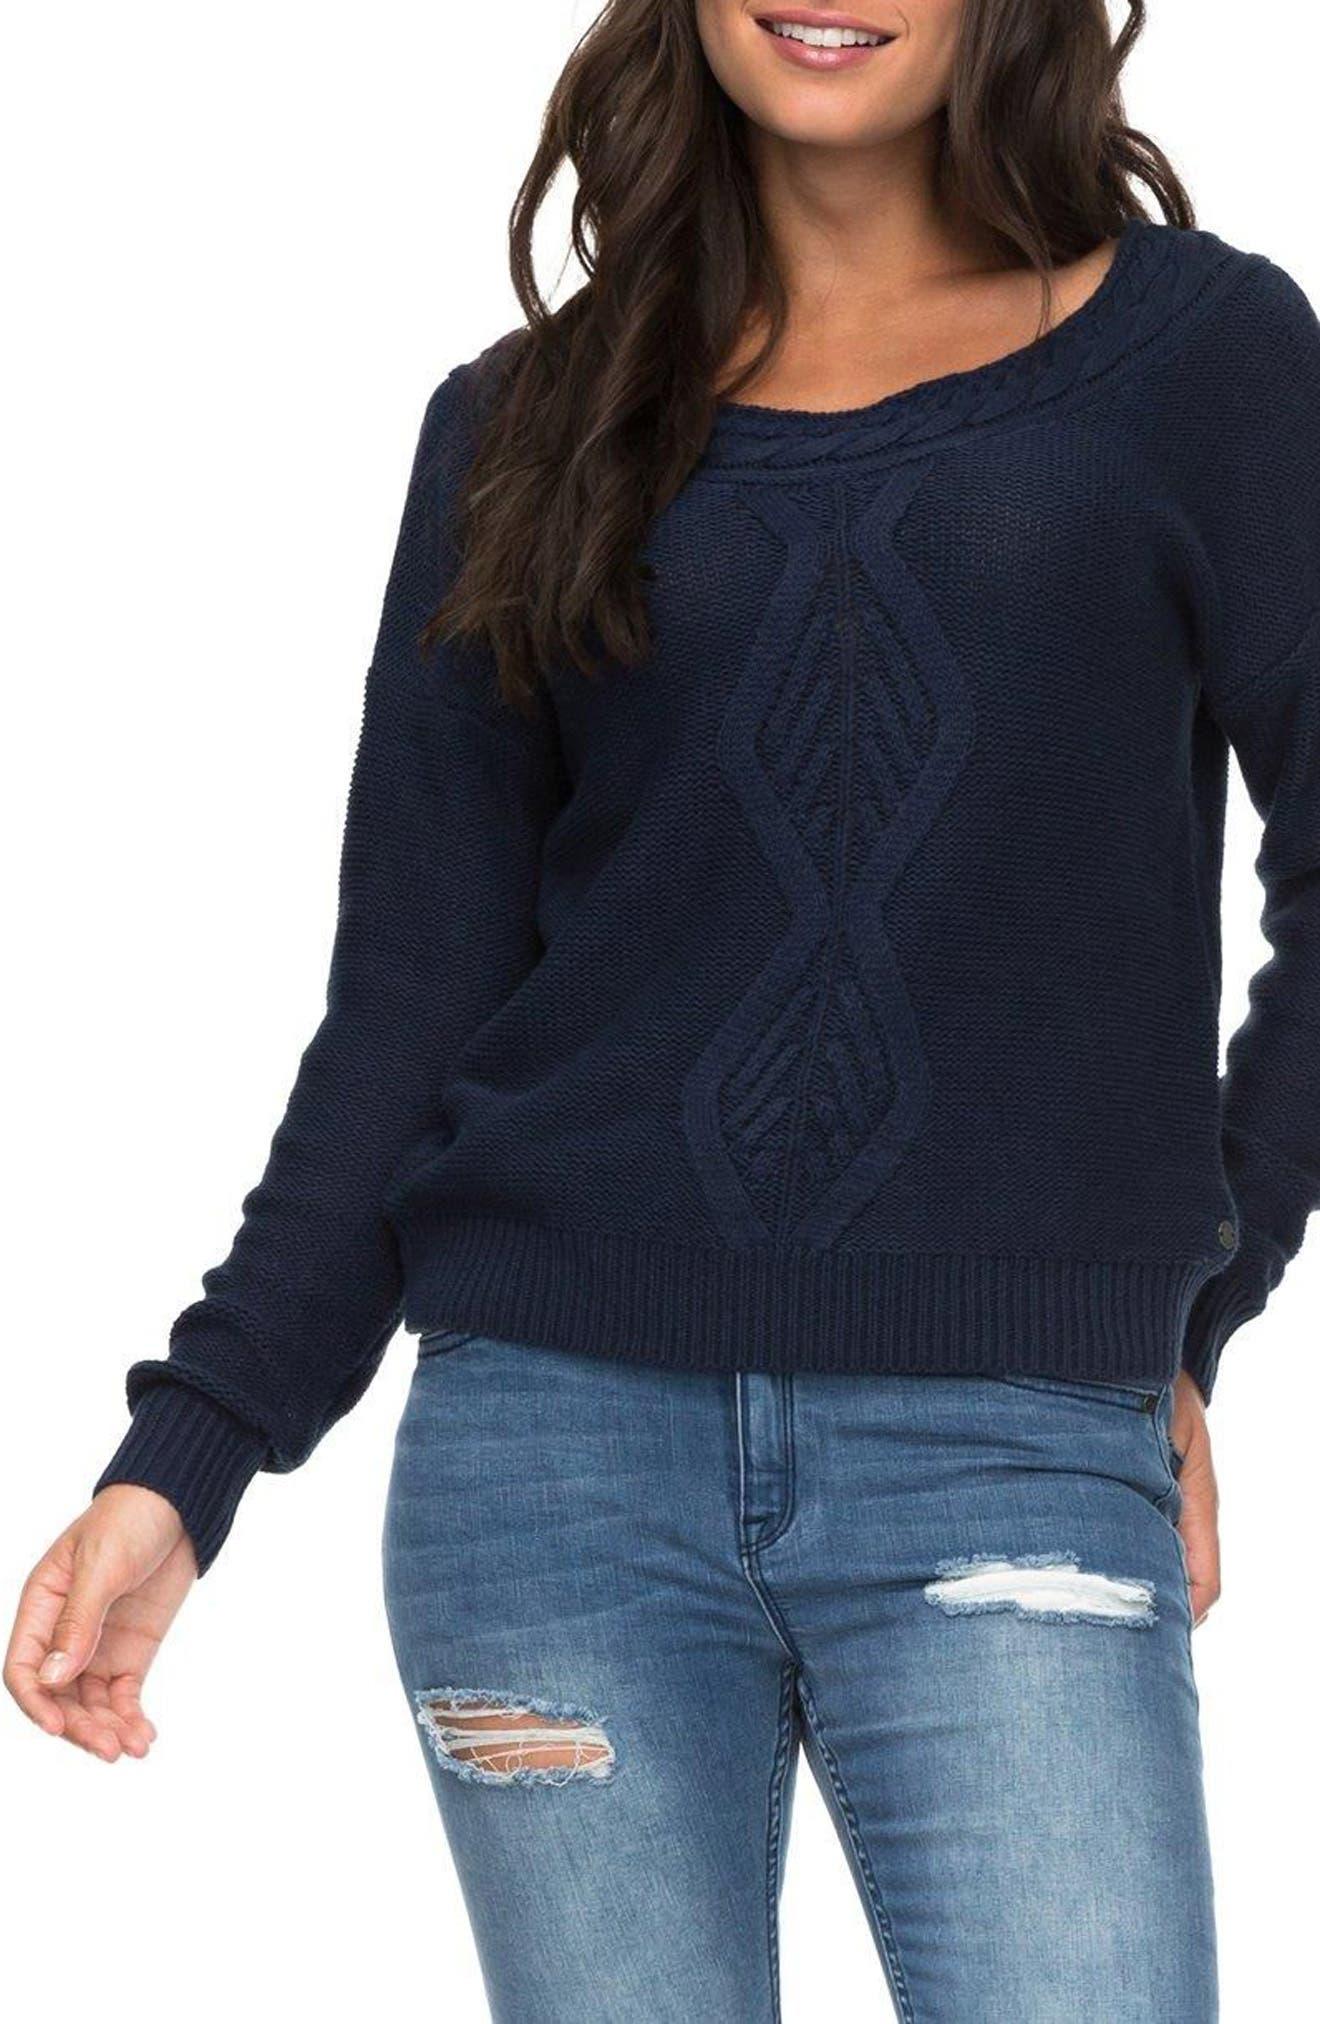 Roxy Choose to Shine Sweater